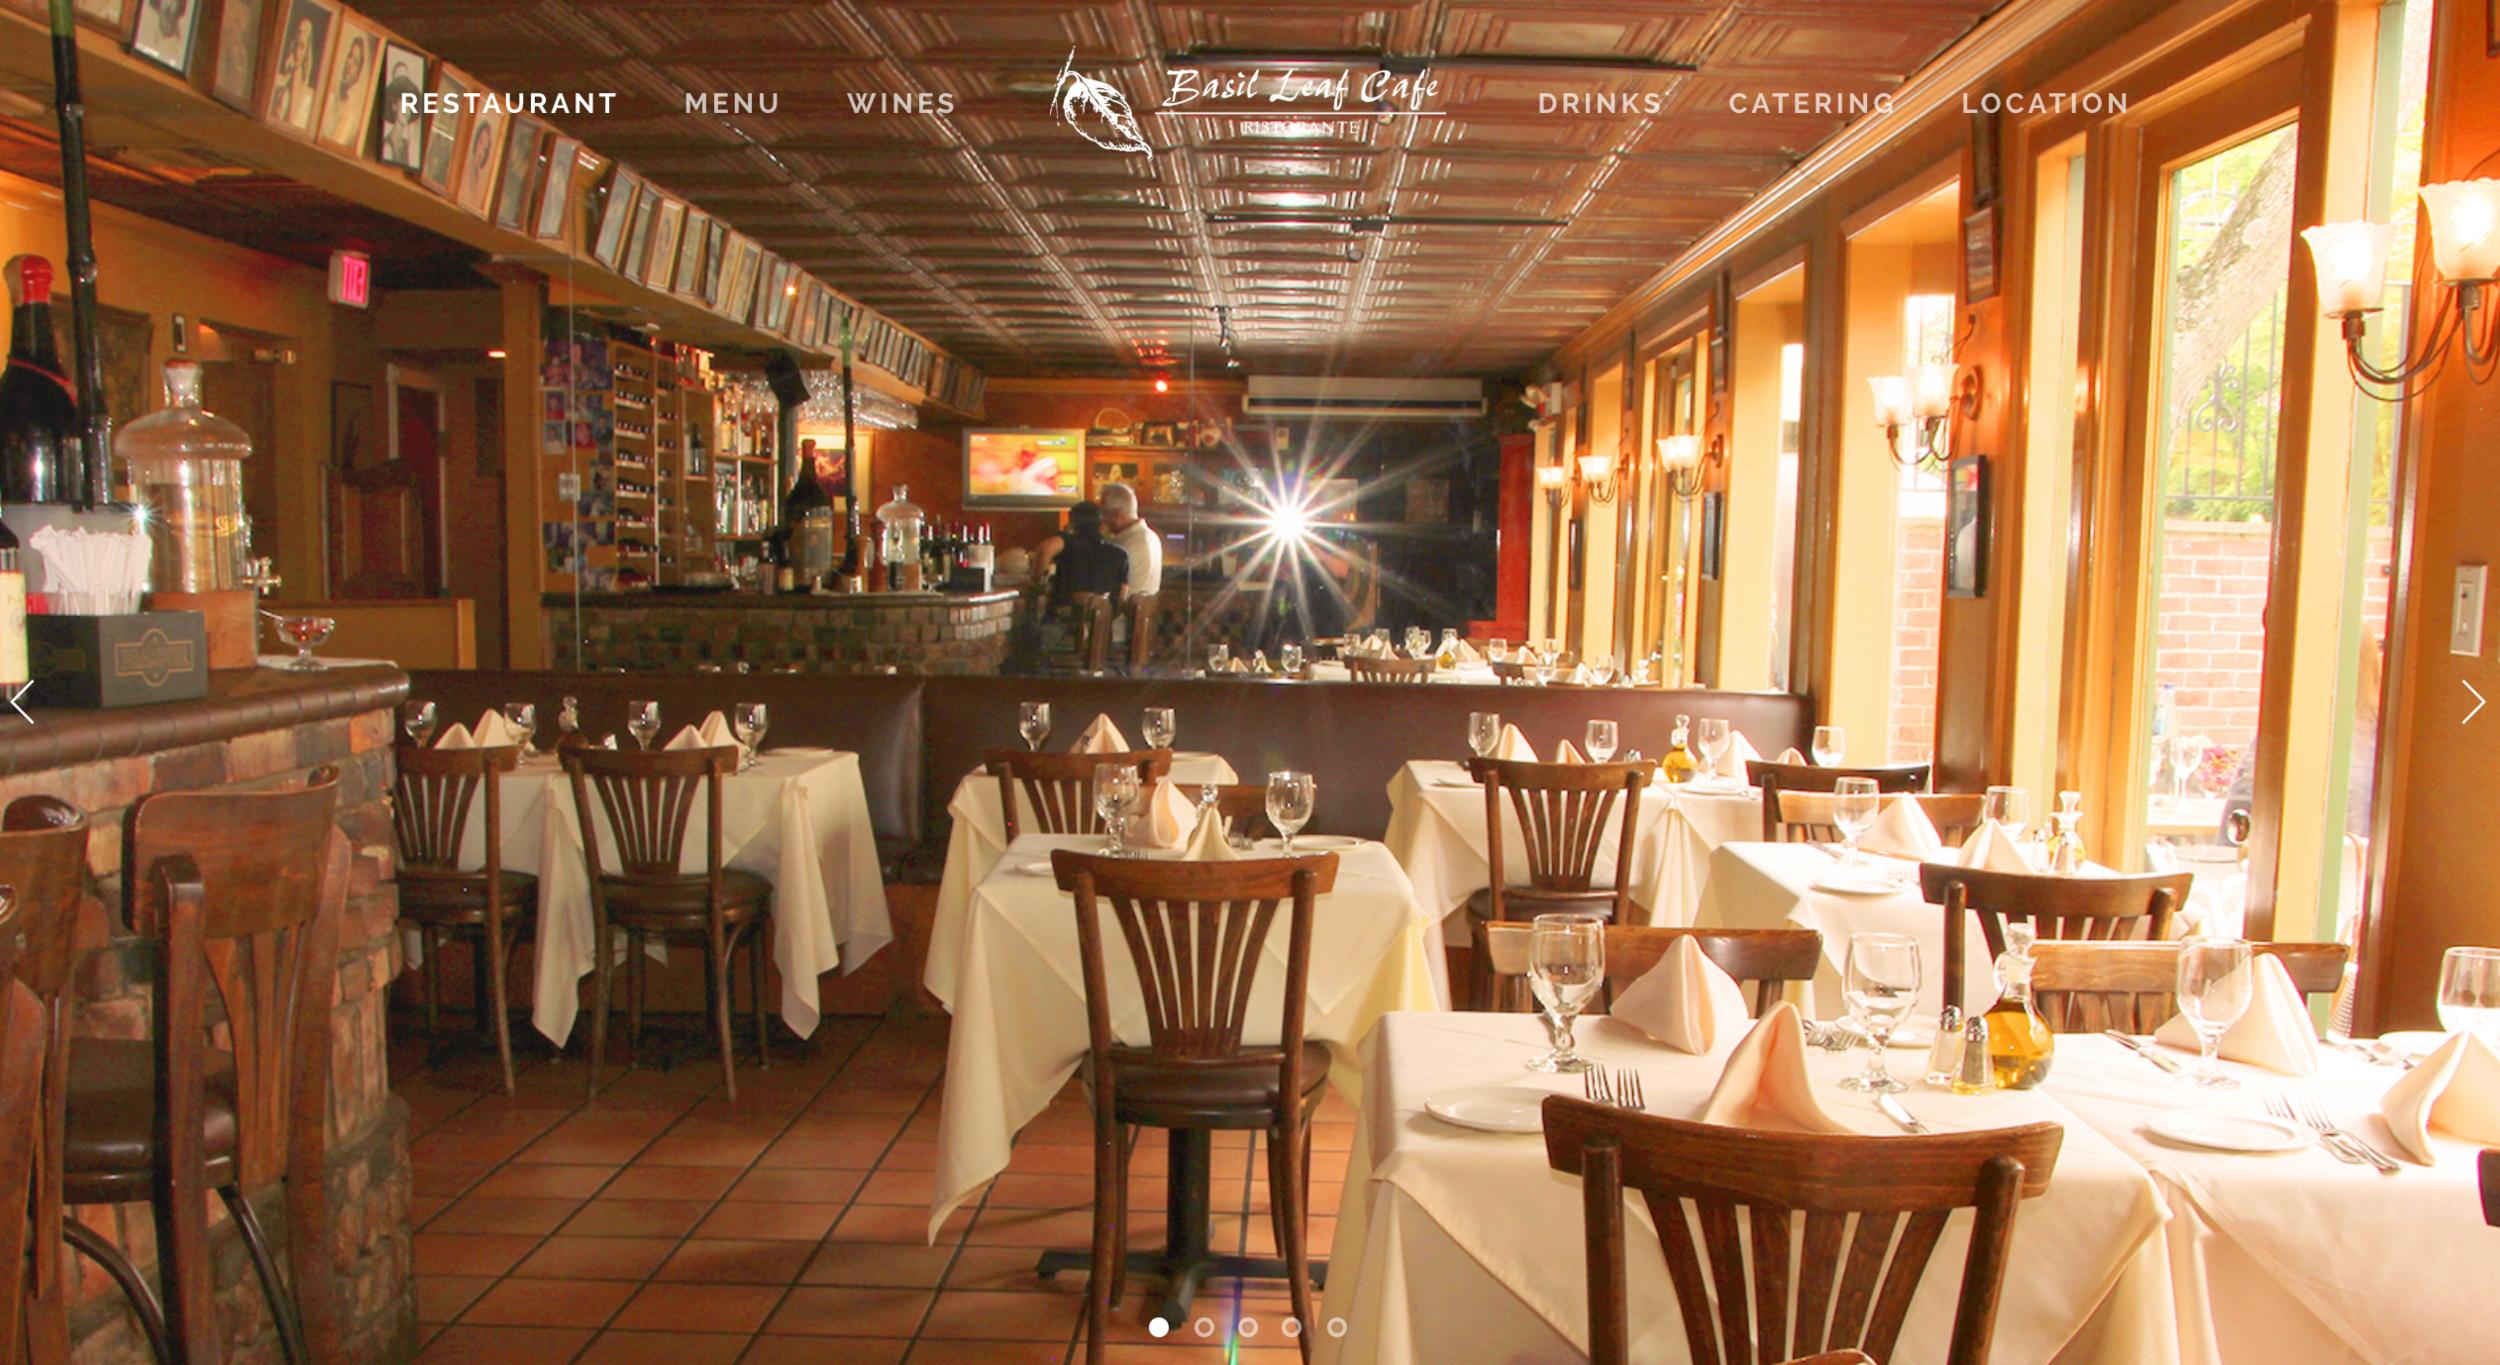 The basil leaf cafe and ristorante